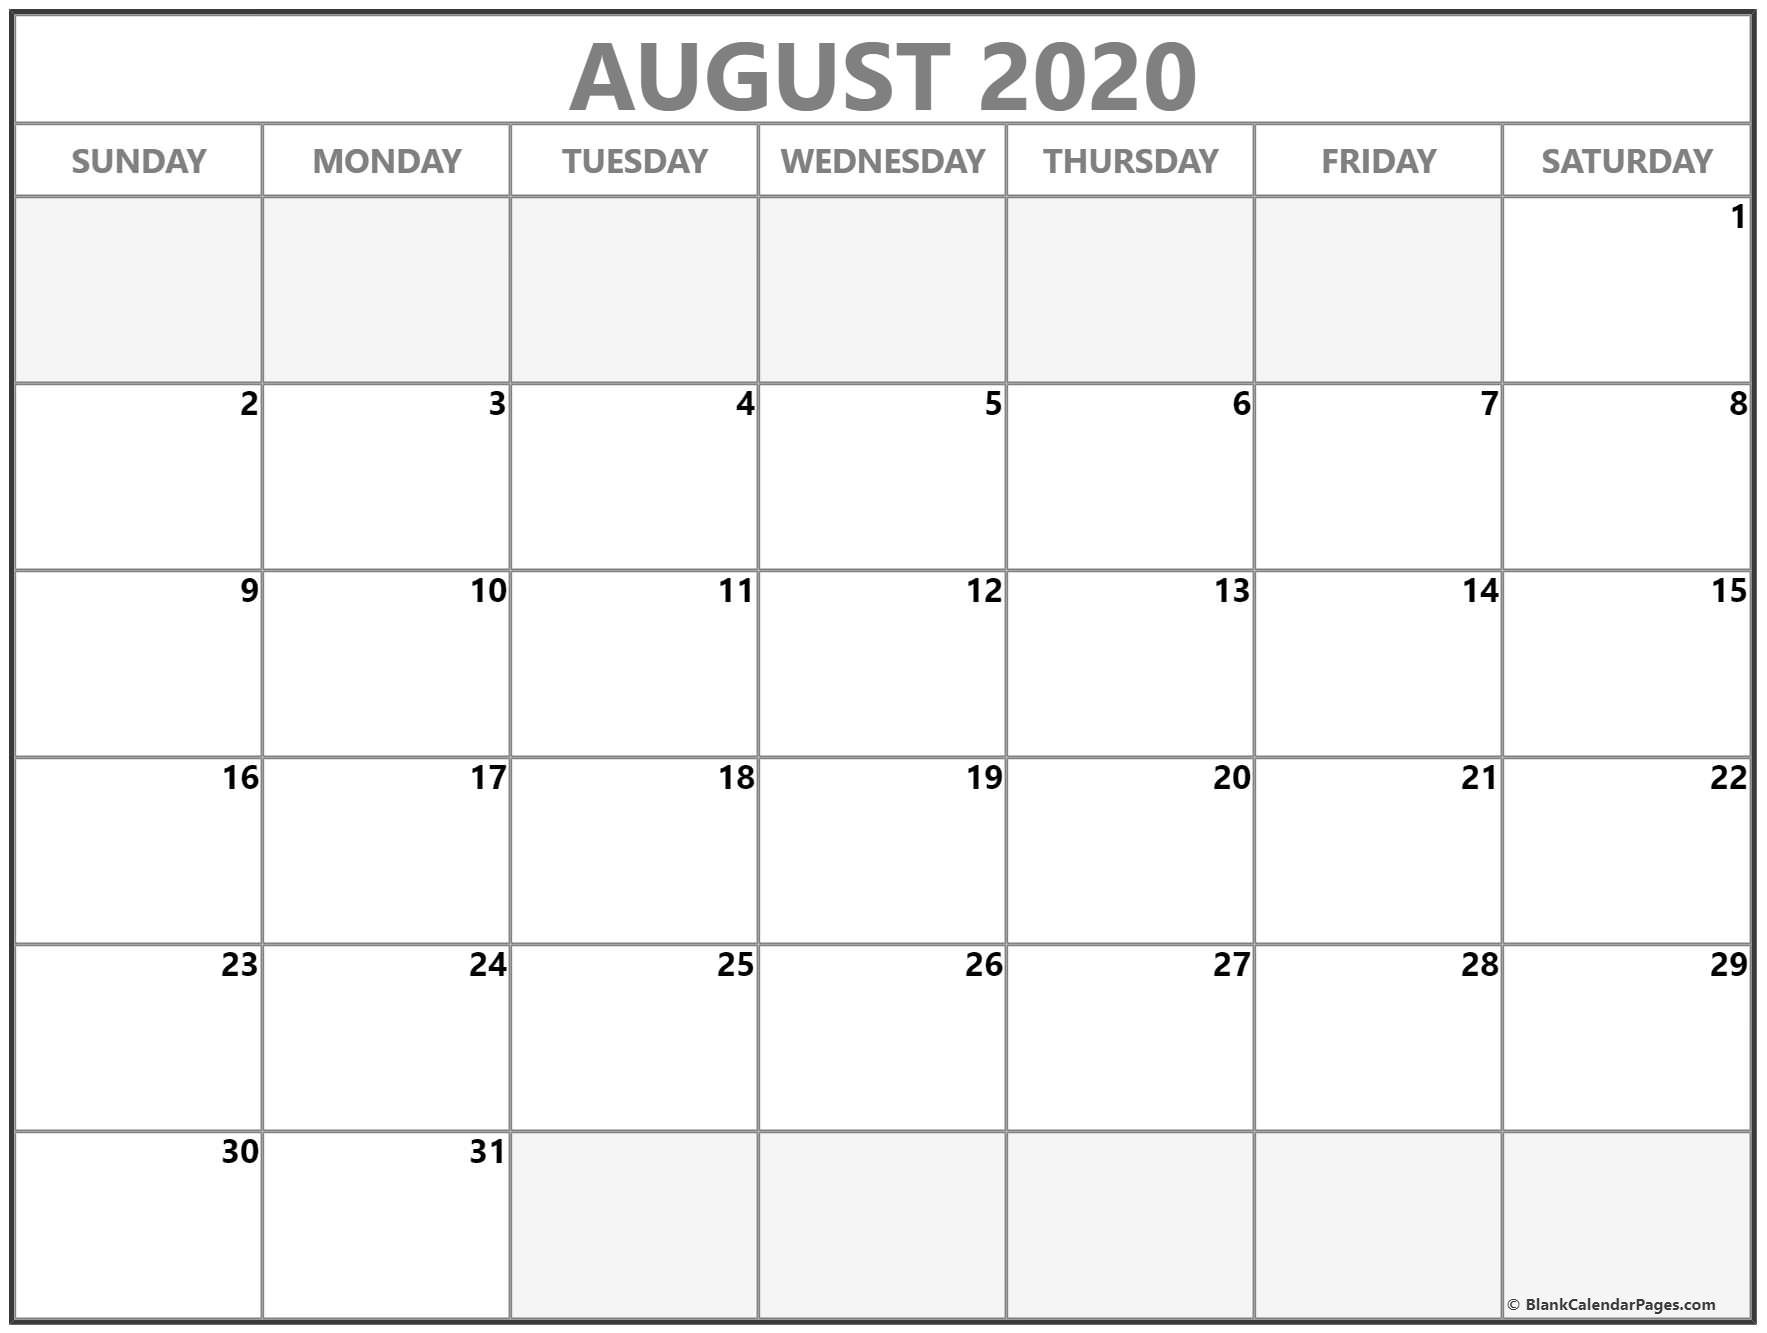 Printable 30 Day Calendar August 2020 | Gallery Of Calendar